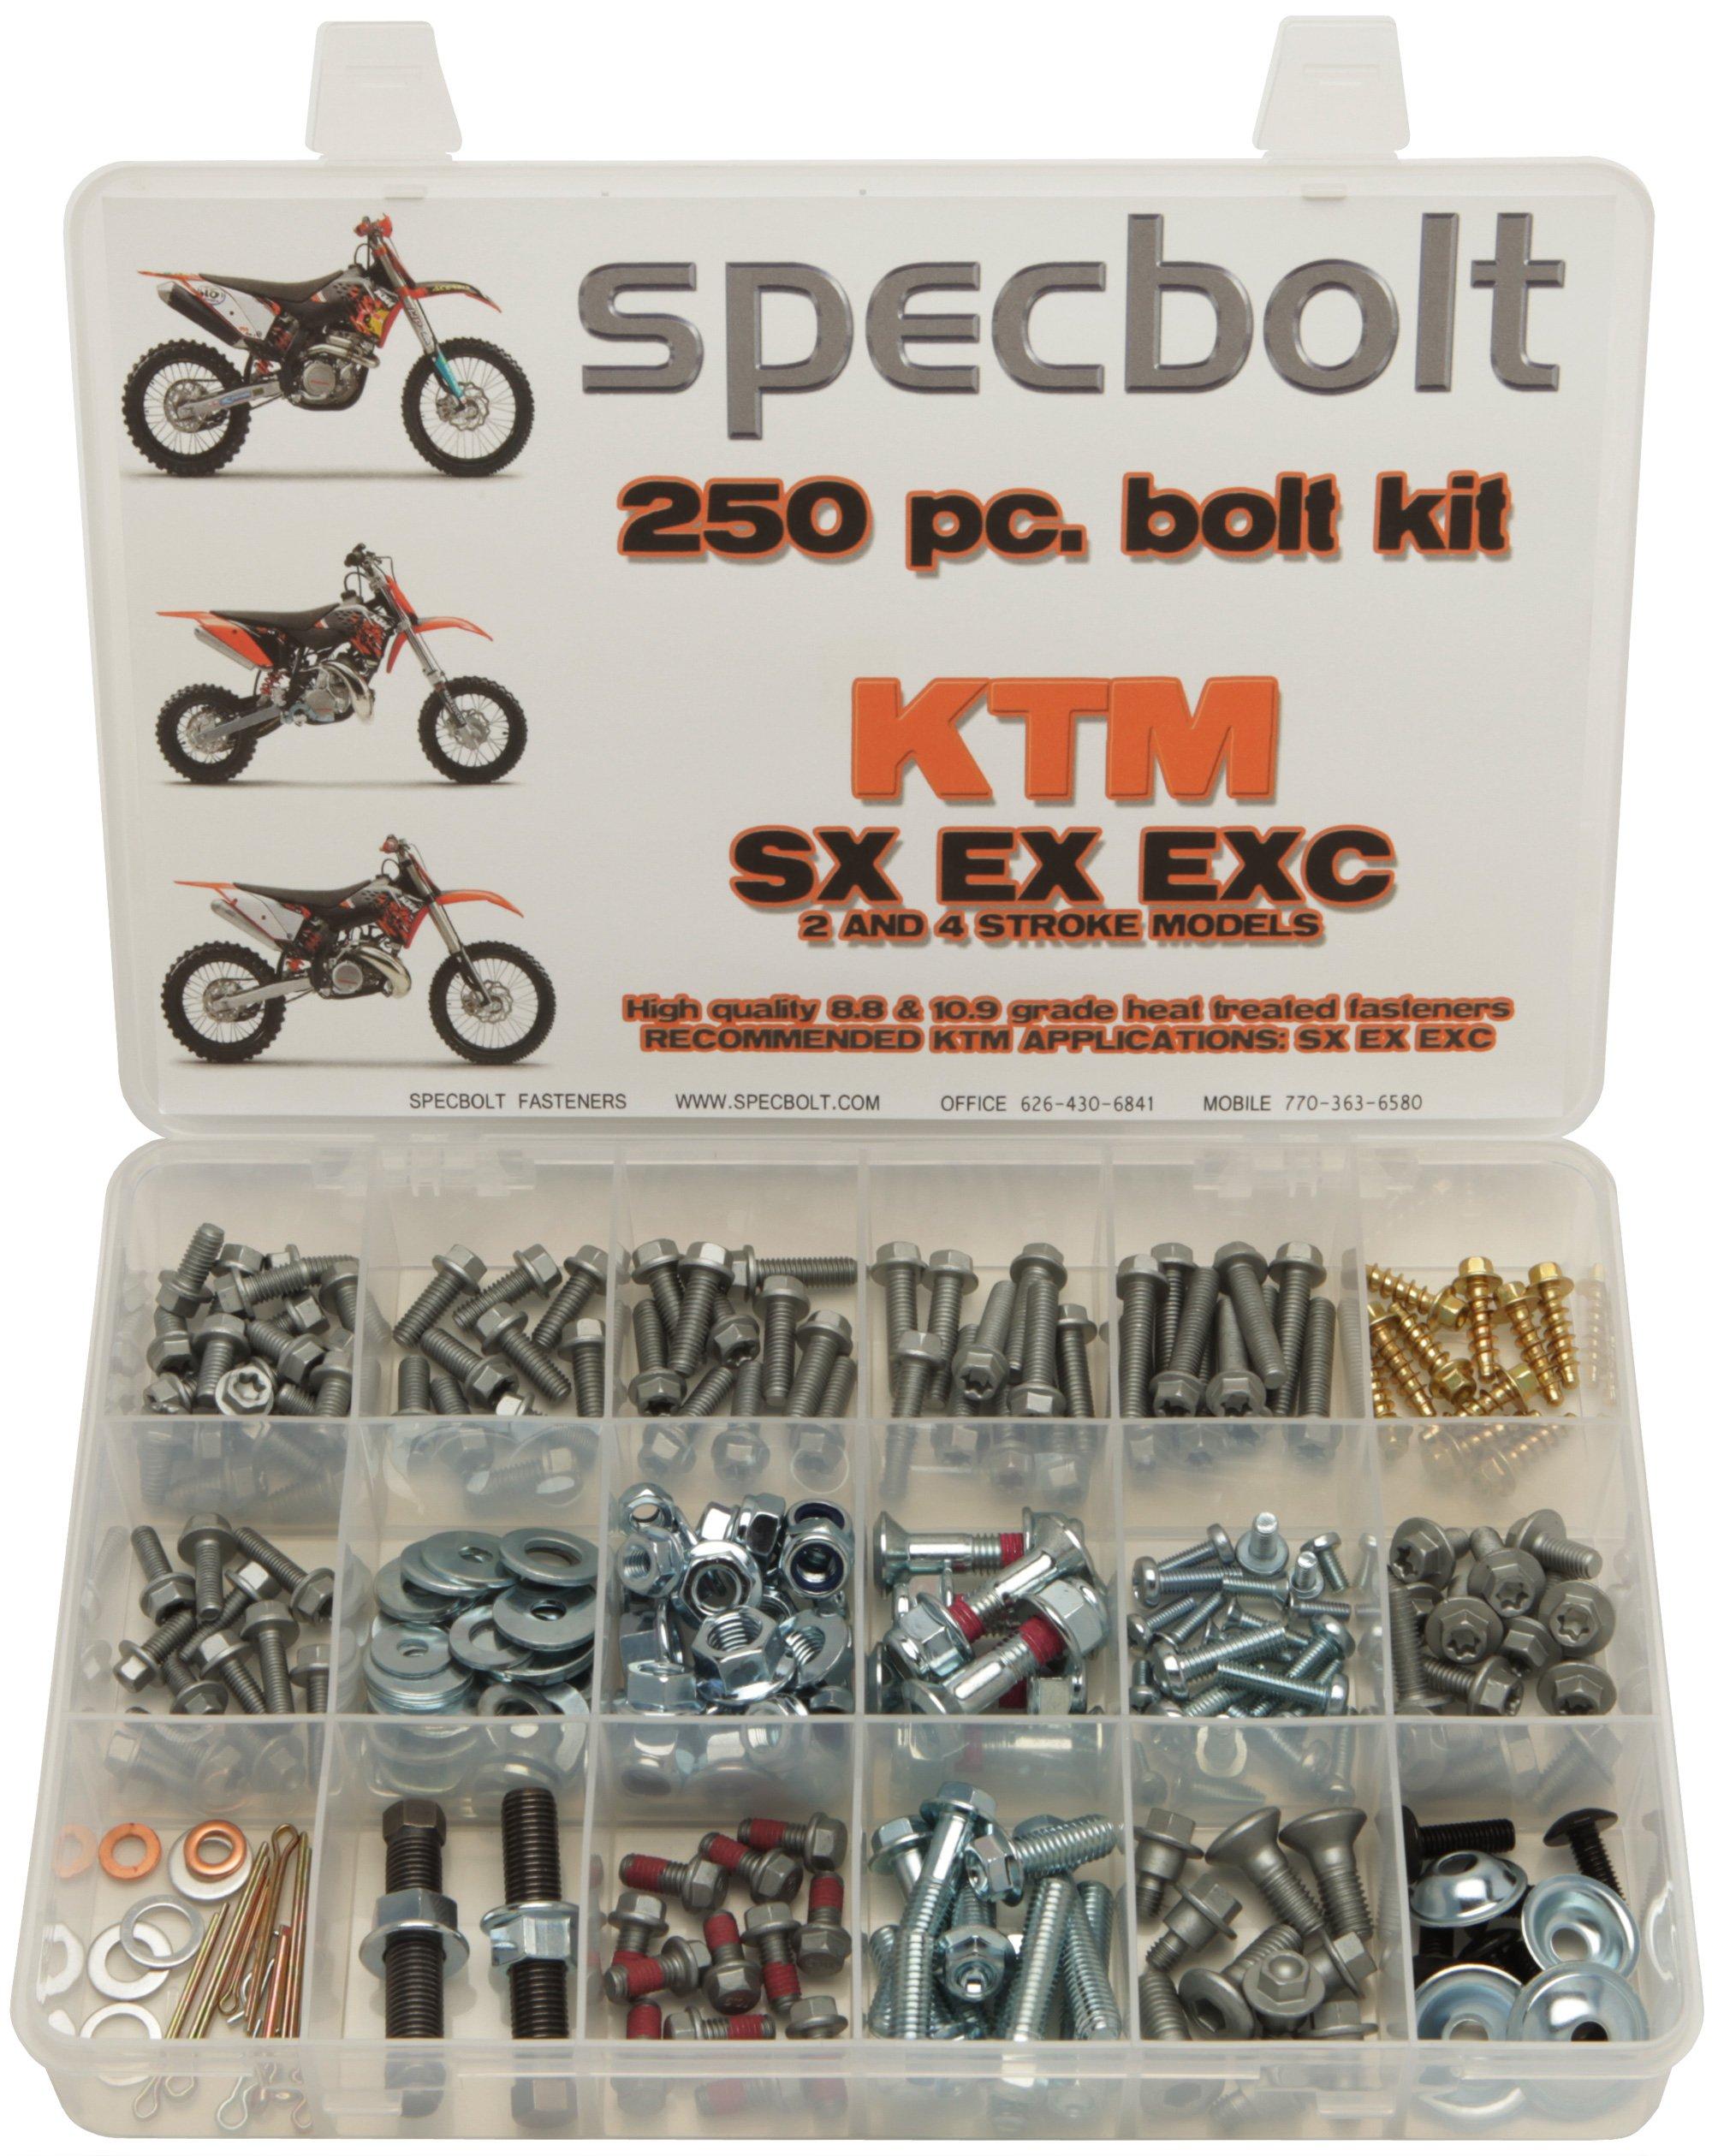 250pc Specbolt KTM SX EX EXC Bolt Kit for Maintenance & Restoration of MX Dirtbike OEM Spec Fastener. This includes 2 STROKES: 50 60 65 85 105 125 250 300 550 4 STROKES: 250 350 400 450 500 520 525